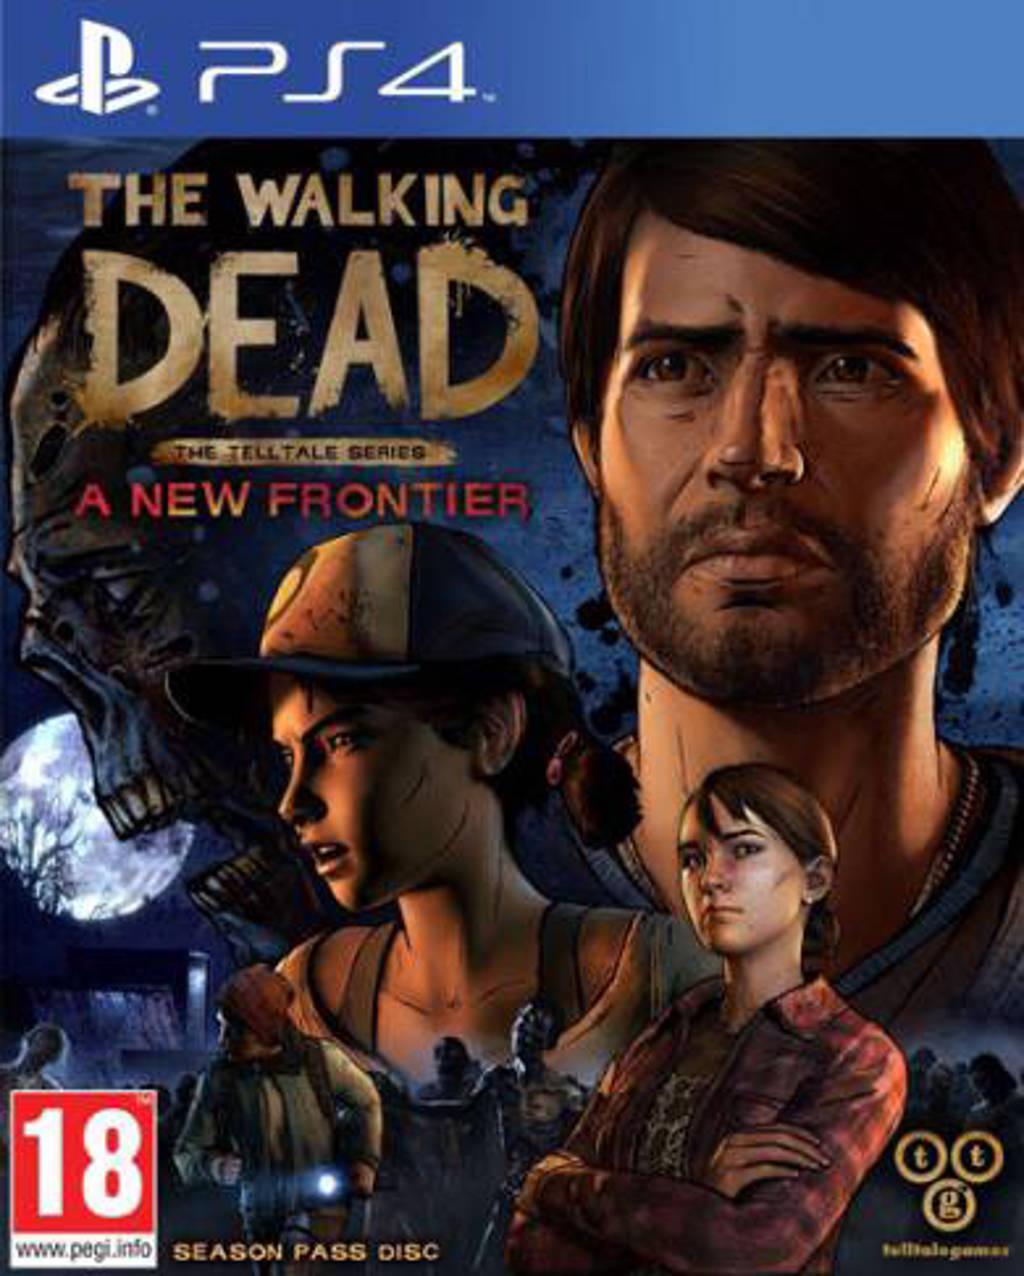 Walking dead 3 - Telltale series (PlayStation 4)